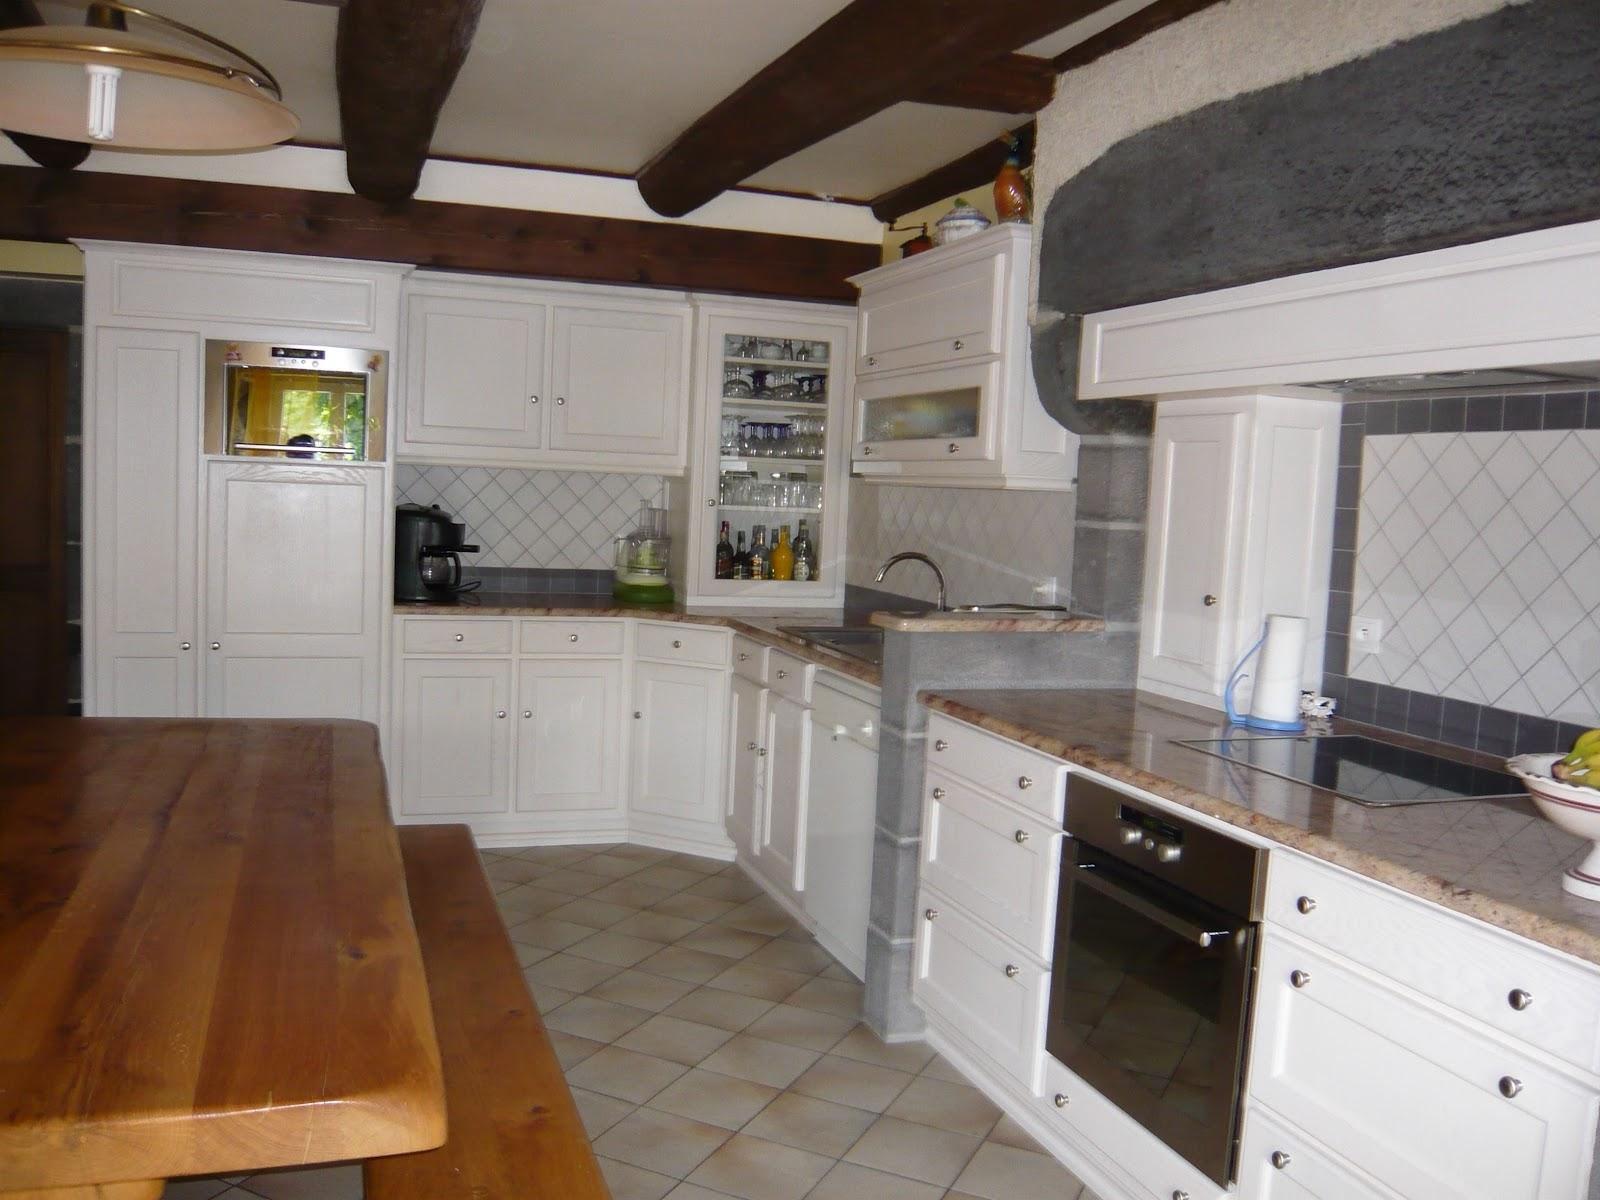 Artisan fabricant de cuisine. Cantal. Auvergne. Cuisiniste. Meubles ...